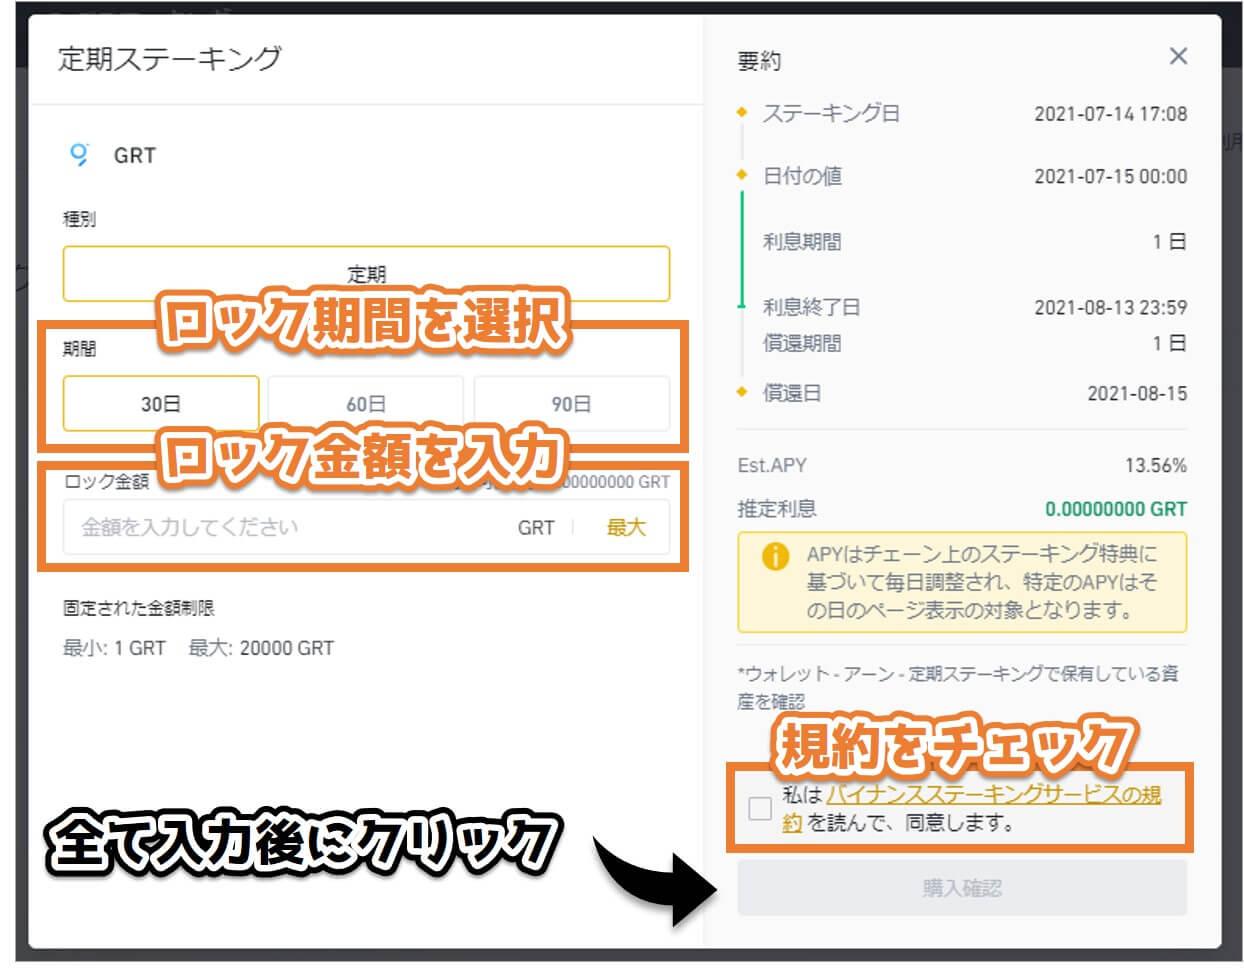 PC版のステーキング設定画面